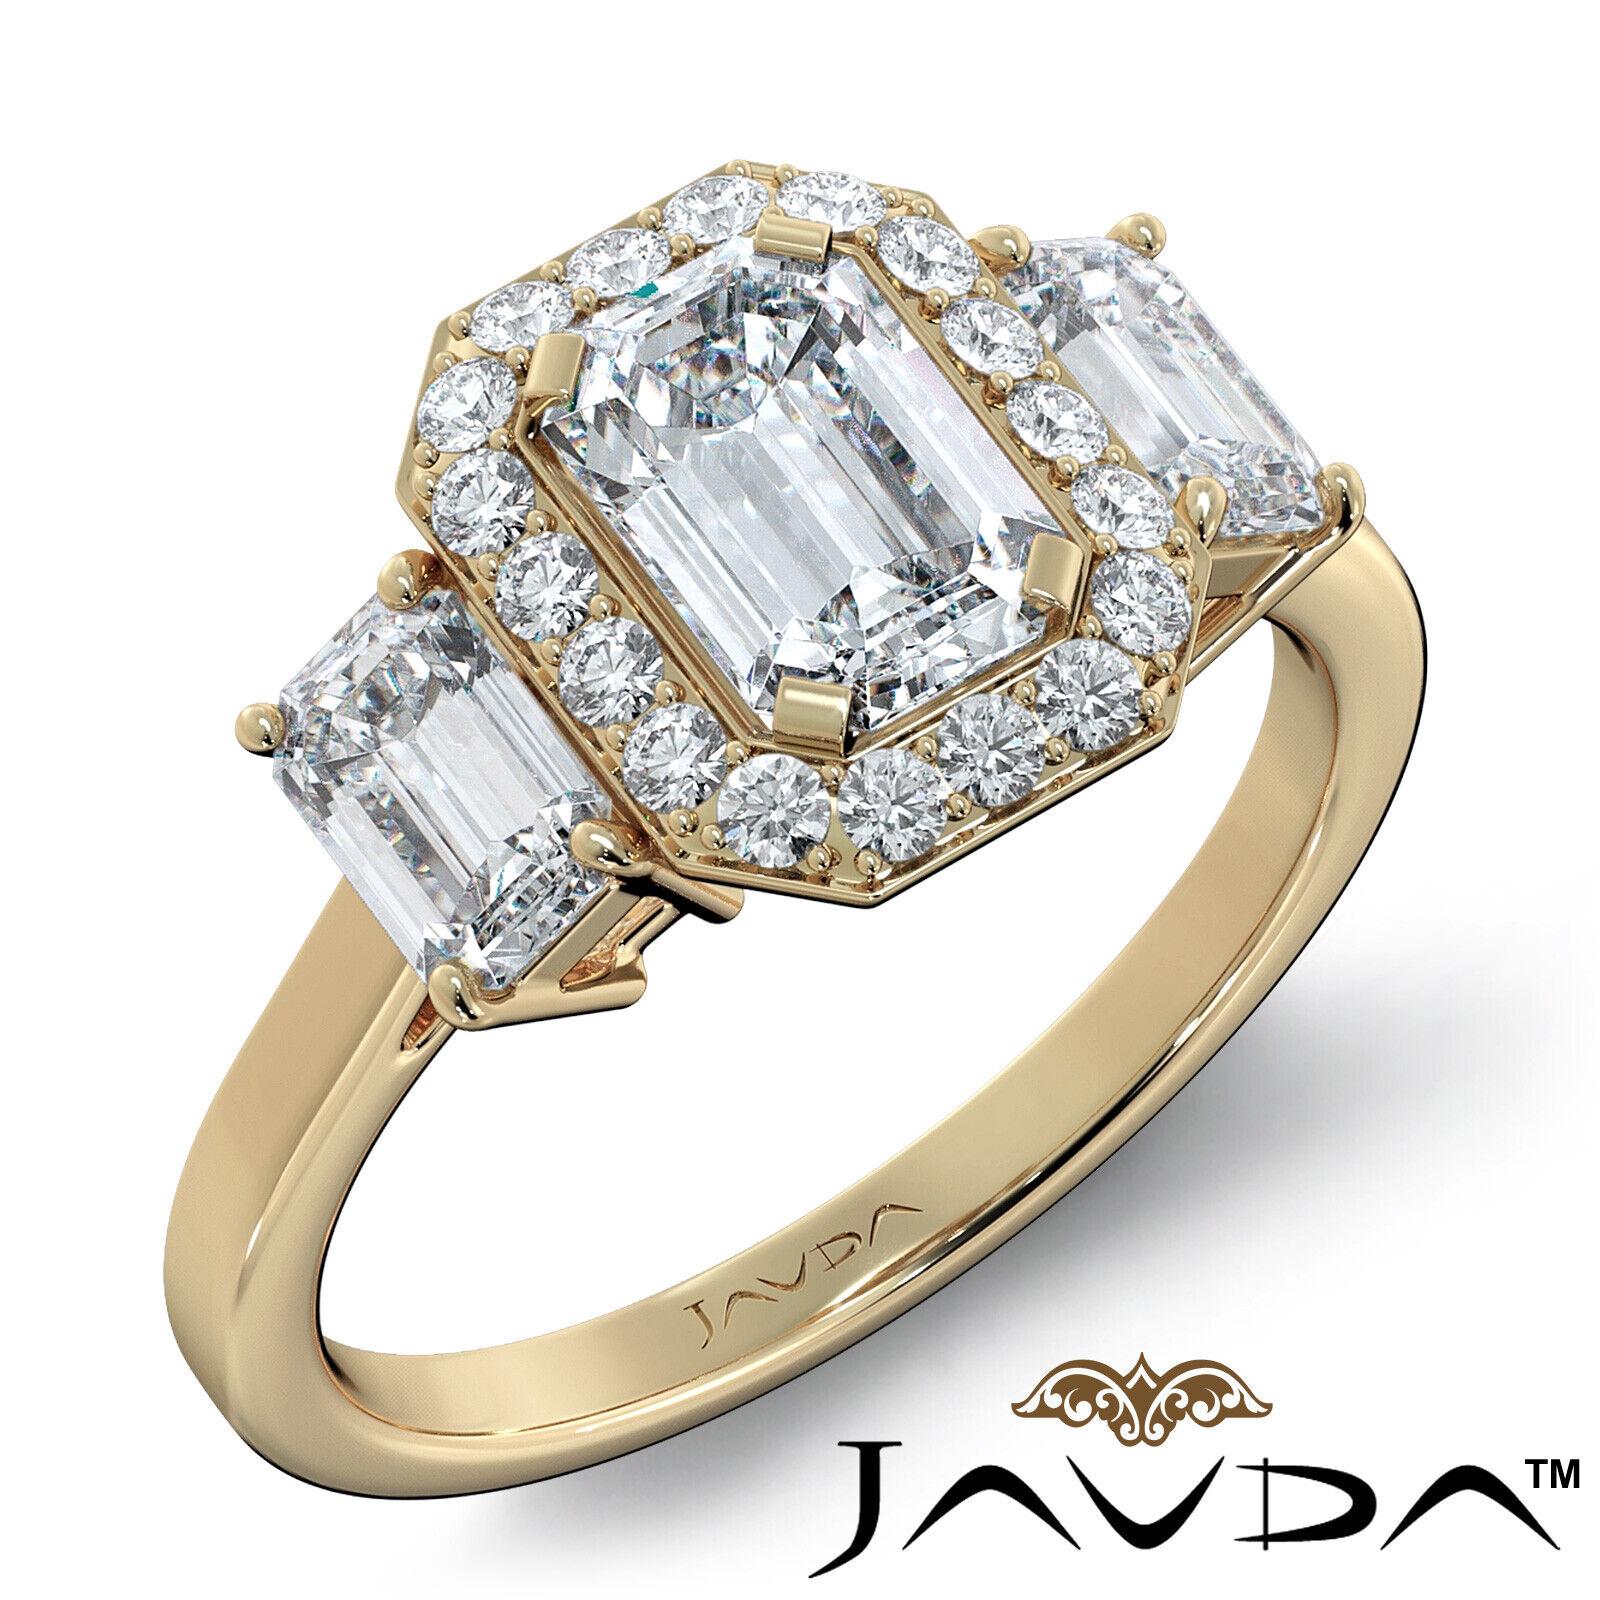 1.55ctw 3 Stone Halo Pave Emerald Diamond Engagement Ring GIA F-SI2 White Gold 8